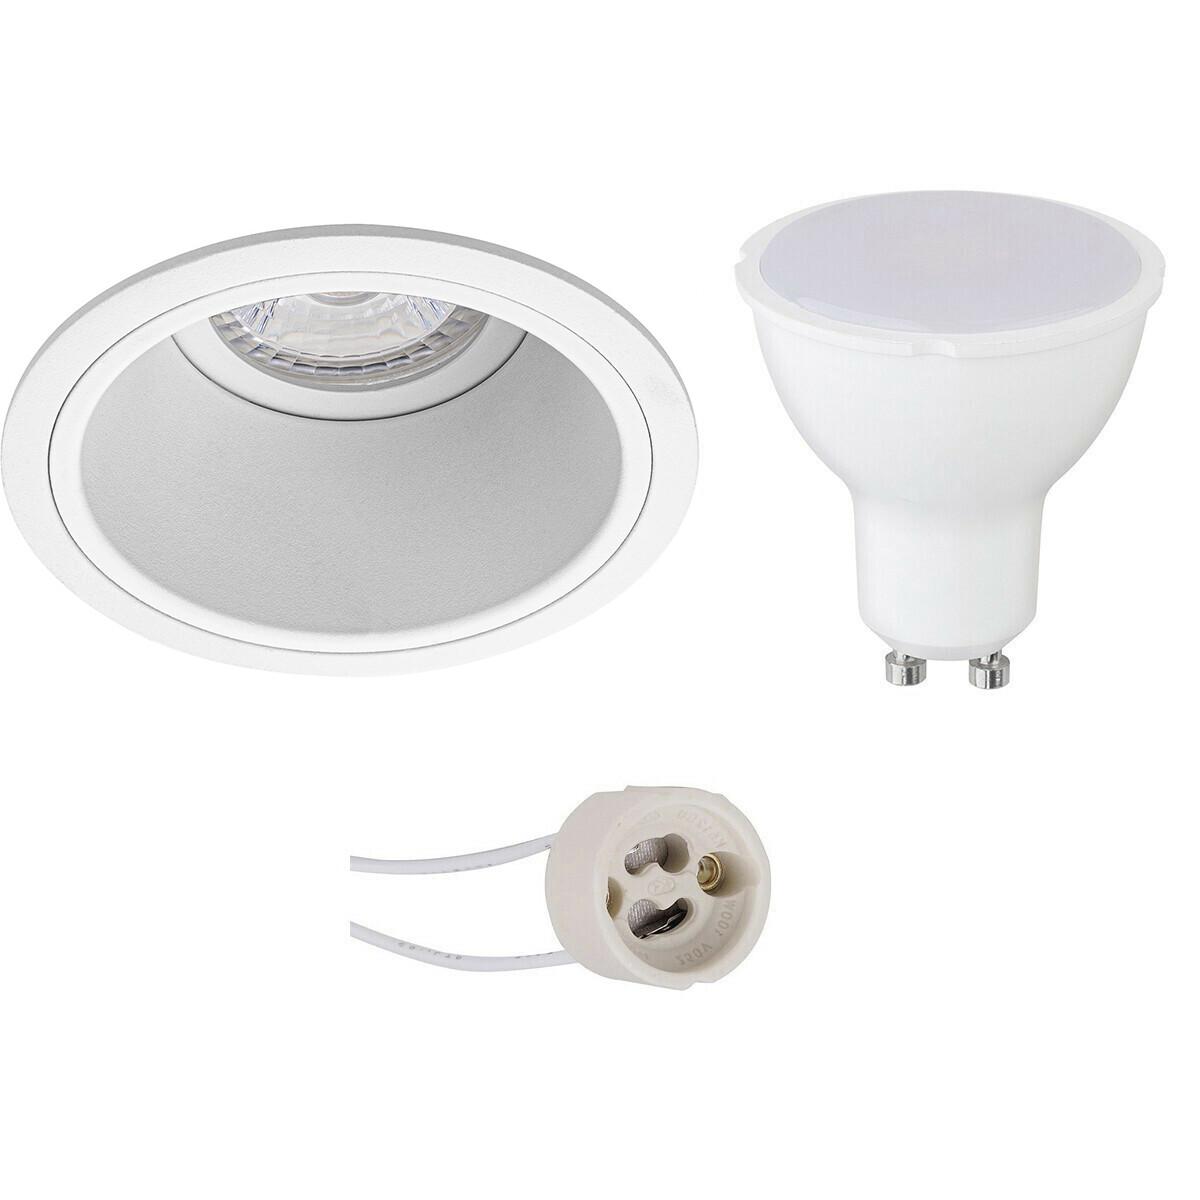 LED Spot Set - Pragmi Minko Pro - GU10 Fitting - Dimbaar - Inbouw Rond - Mat Wit - 6W - Natuurlijk W